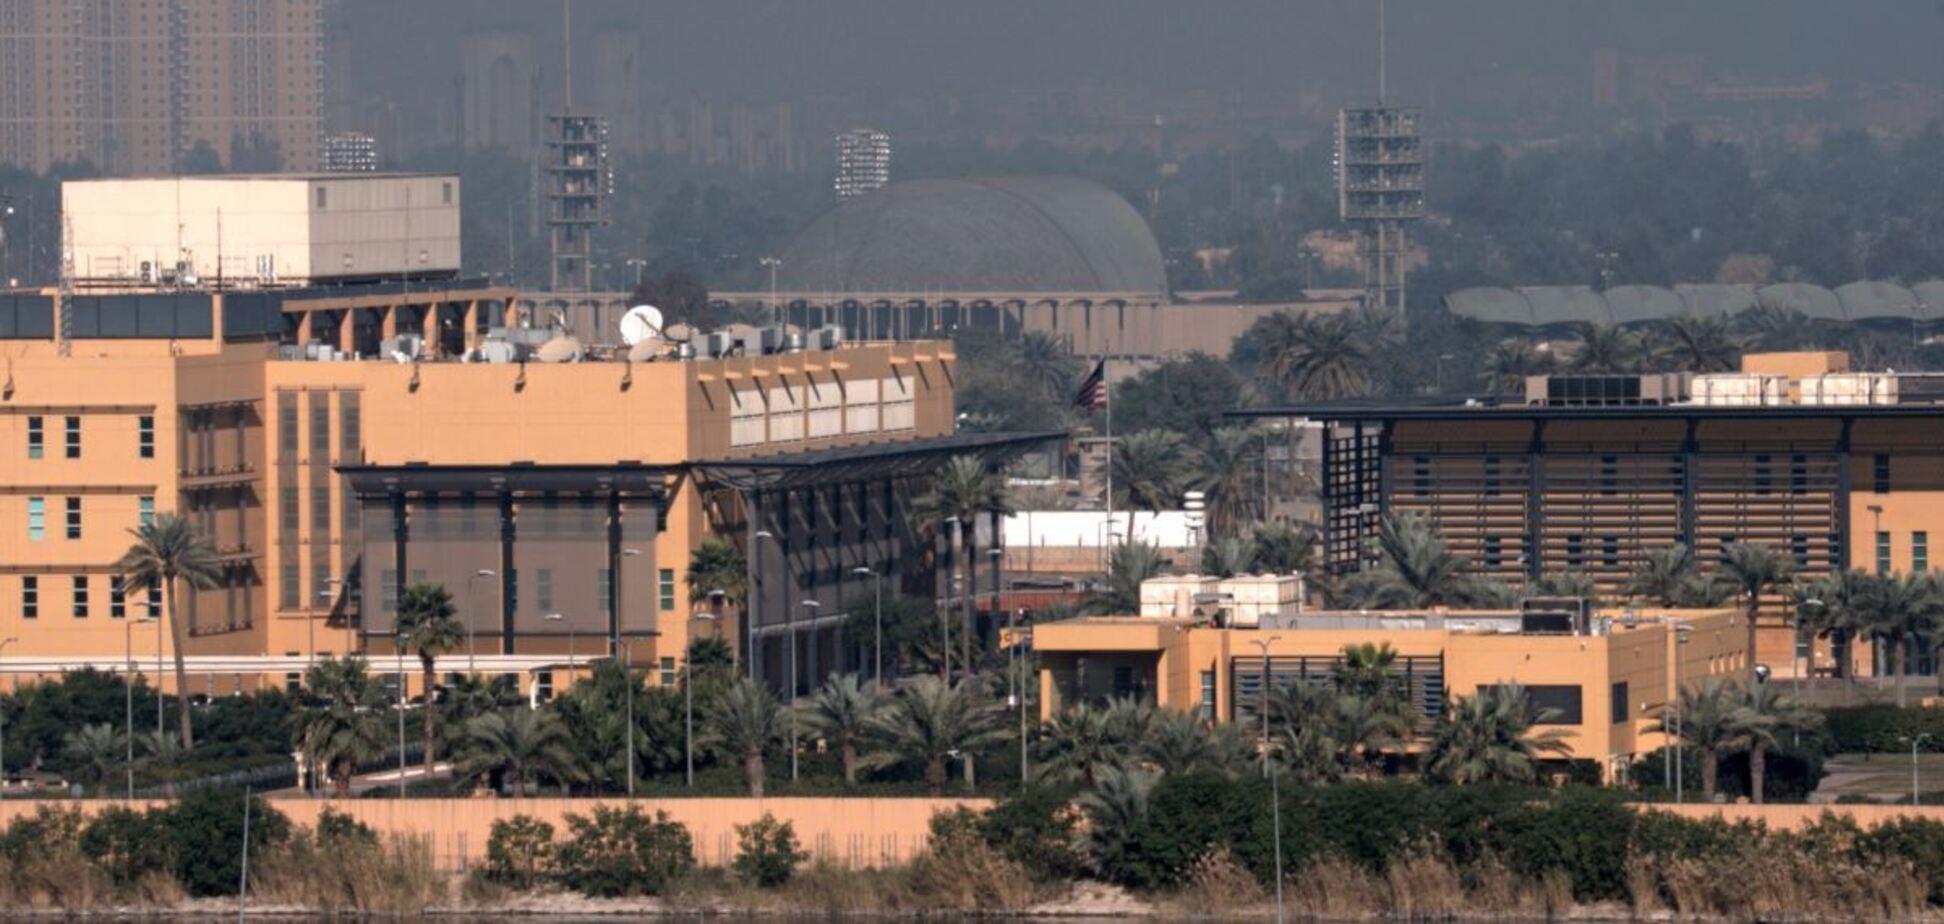 'Зеленую зону' Багдада обстреляли ракеты типа 'Катюша'